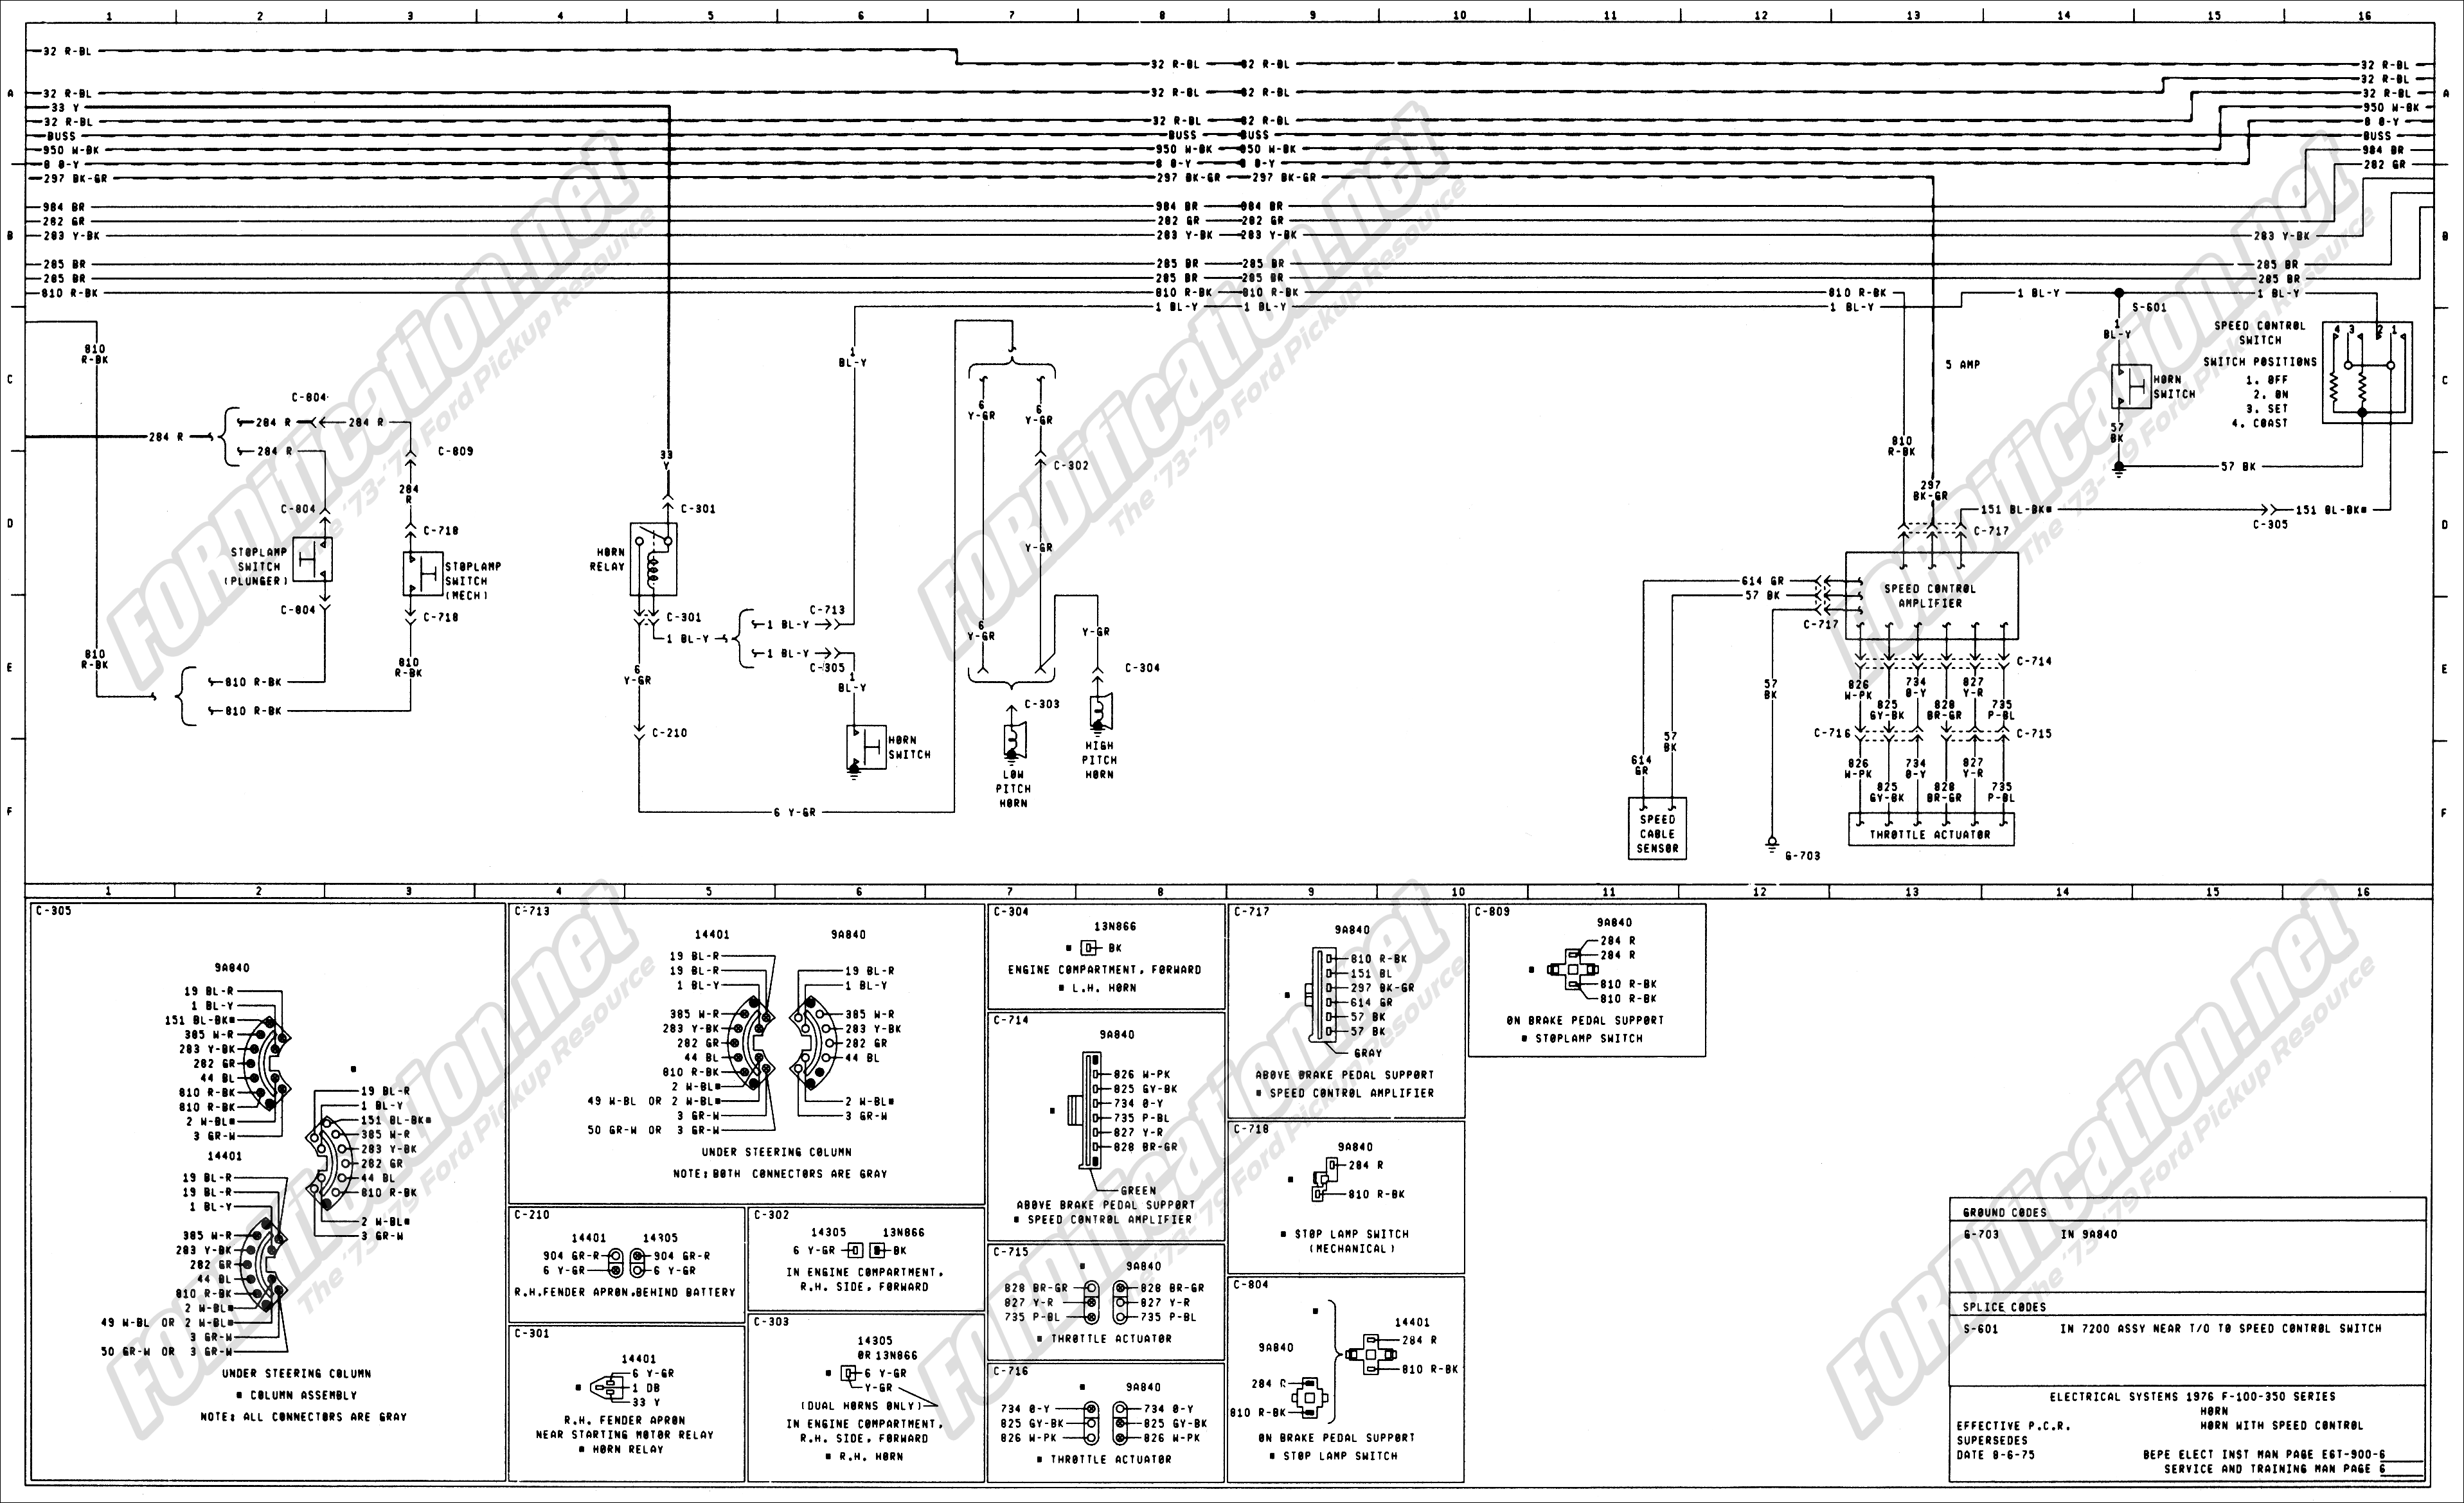 Awe Inspiring 2007 Ford F650 Wiring Diagram Wiring Library Wiring Cloud Orsalboapumohammedshrineorg